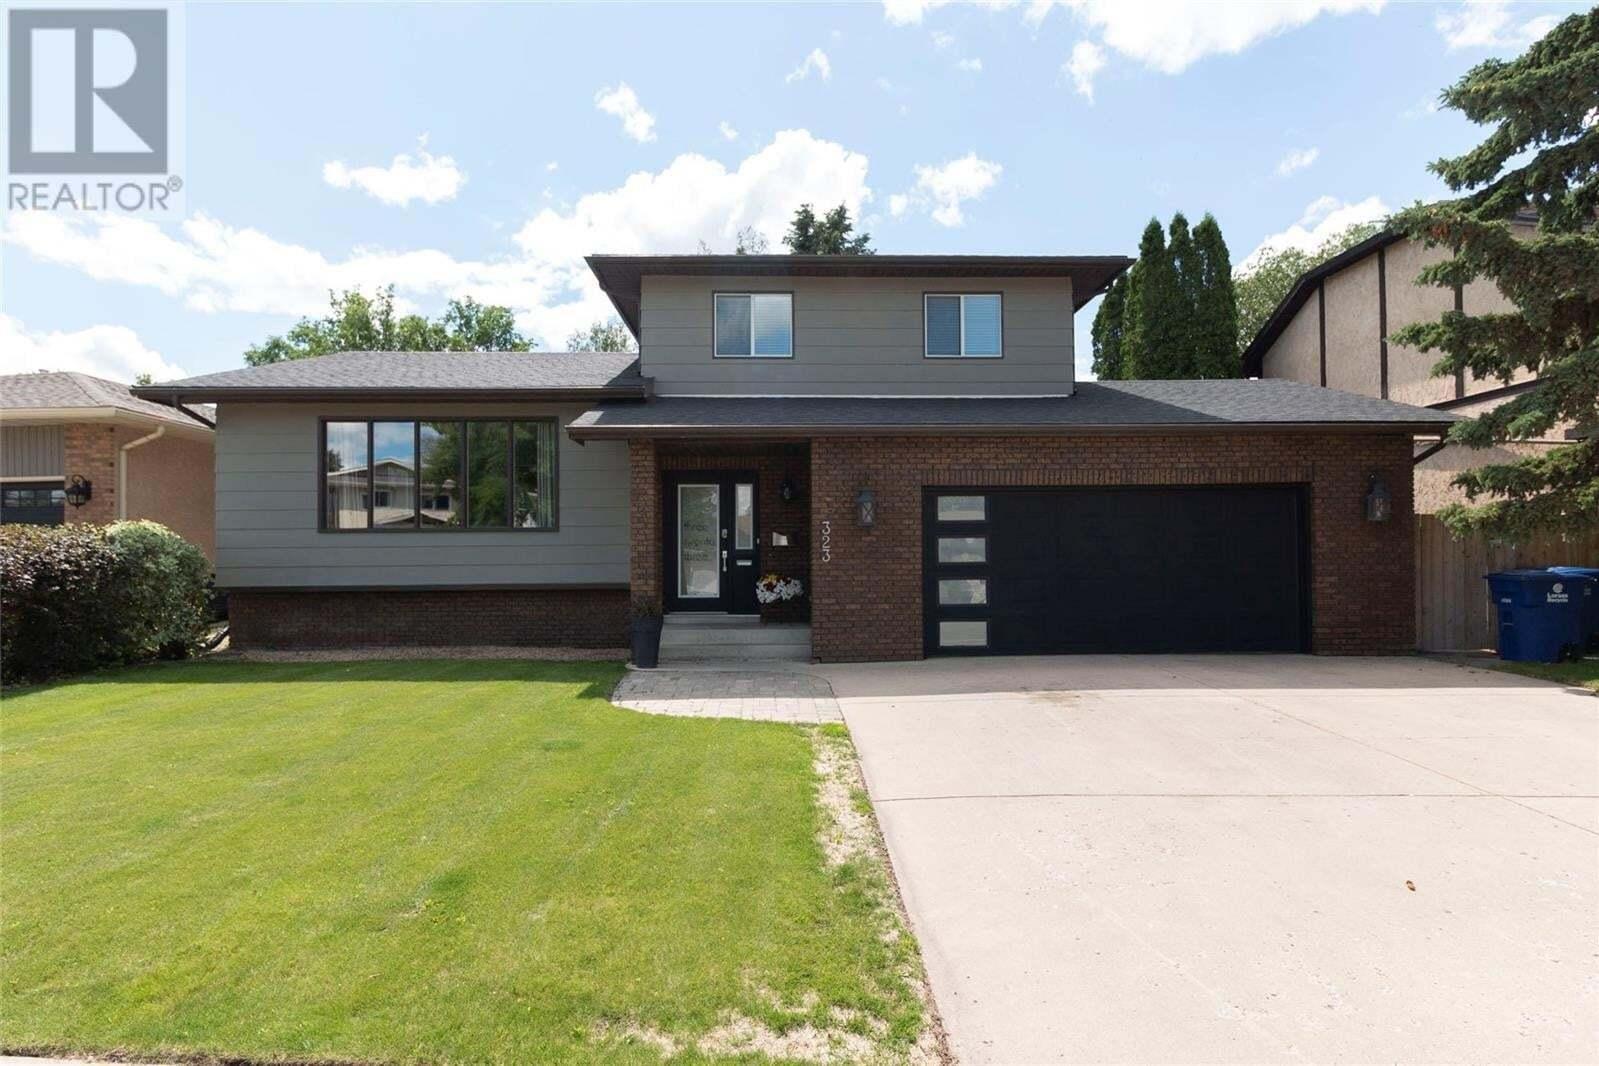 House for sale at 323 Ae Adams Ln Saskatoon Saskatchewan - MLS: SK820833